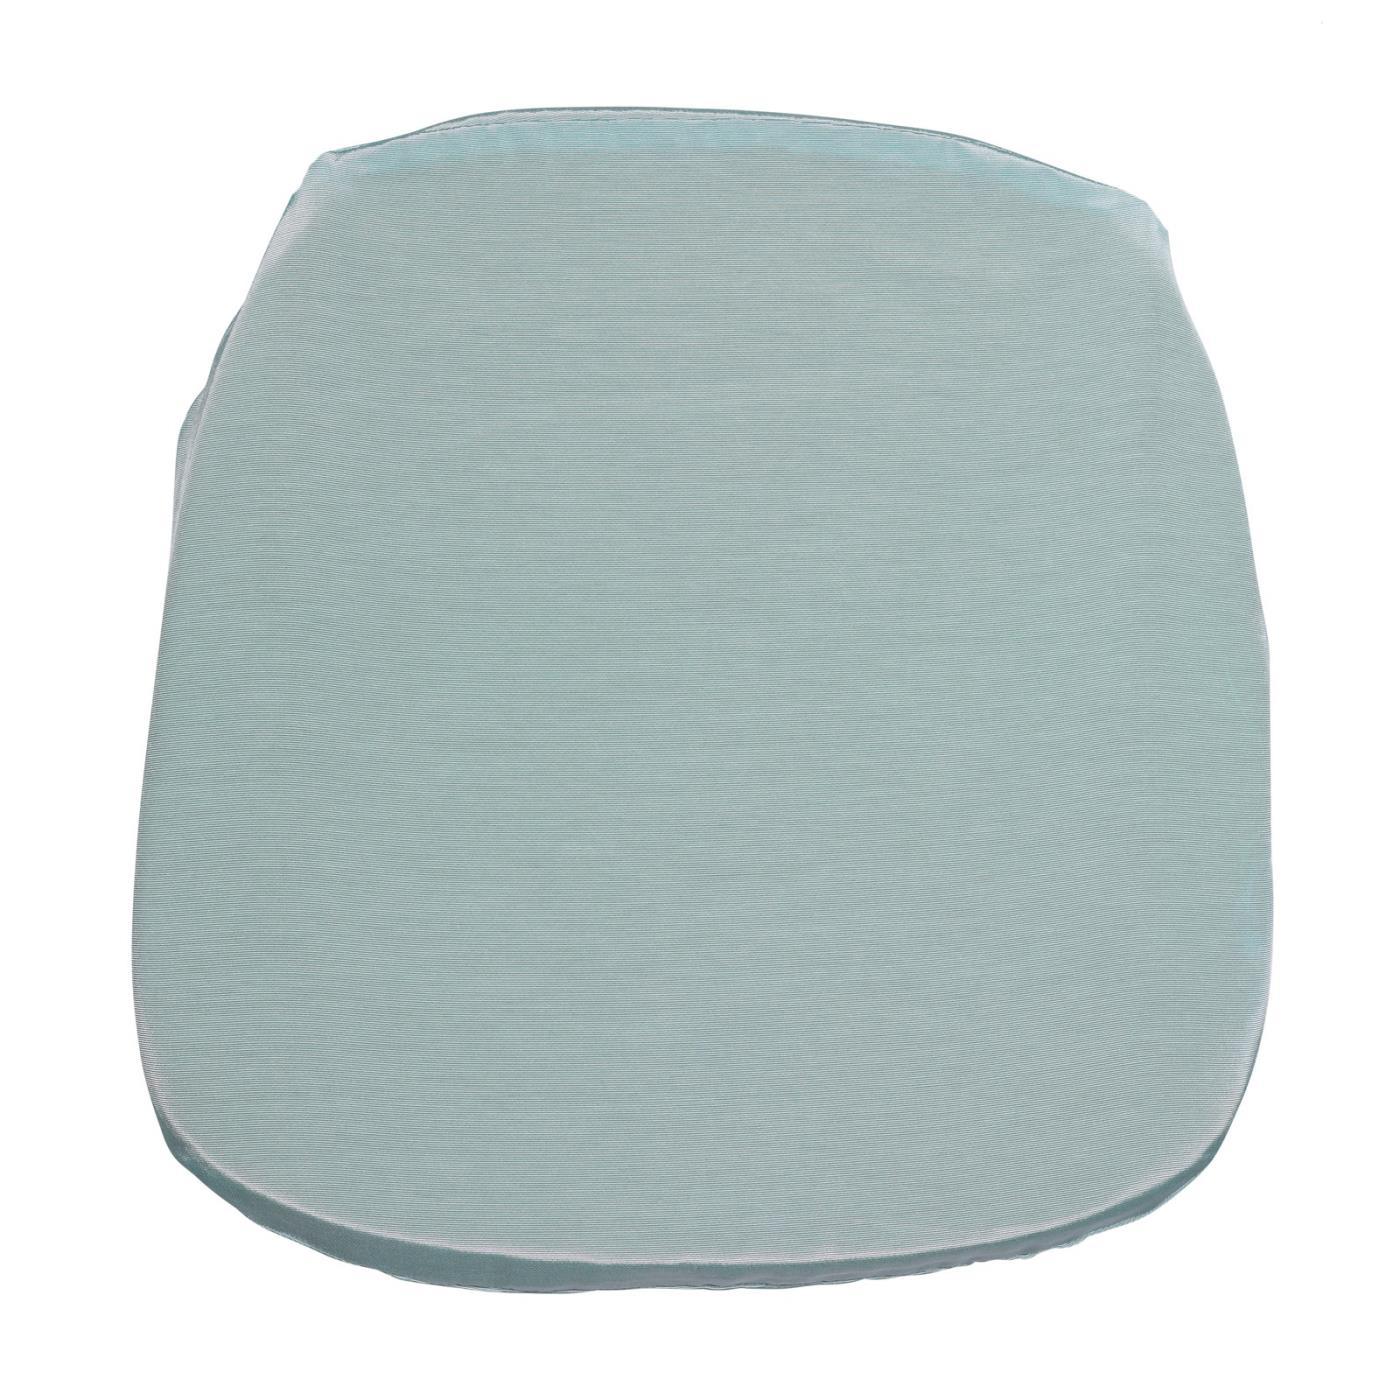 Bengaline Seat Cushion - Aqua